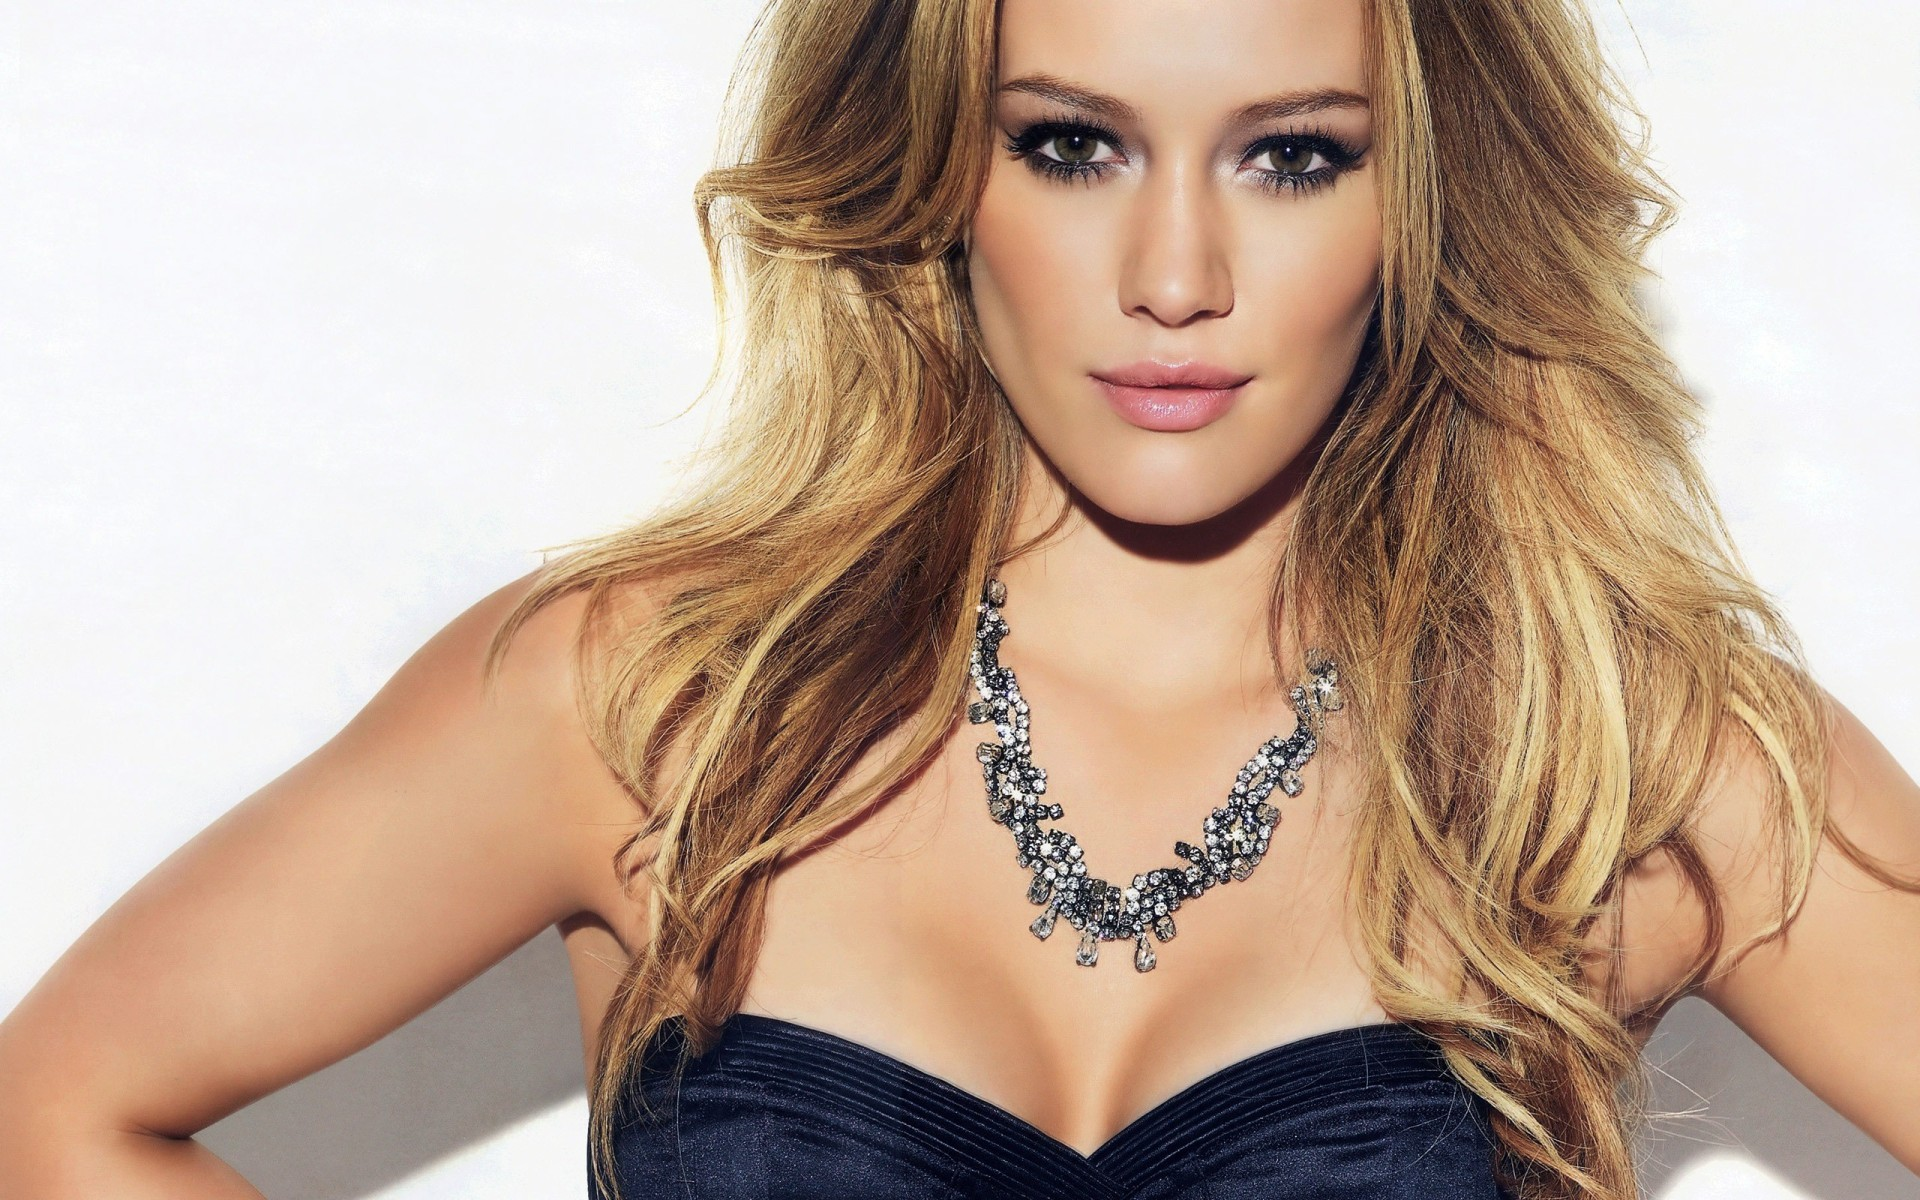 Stunning Hilary Duff